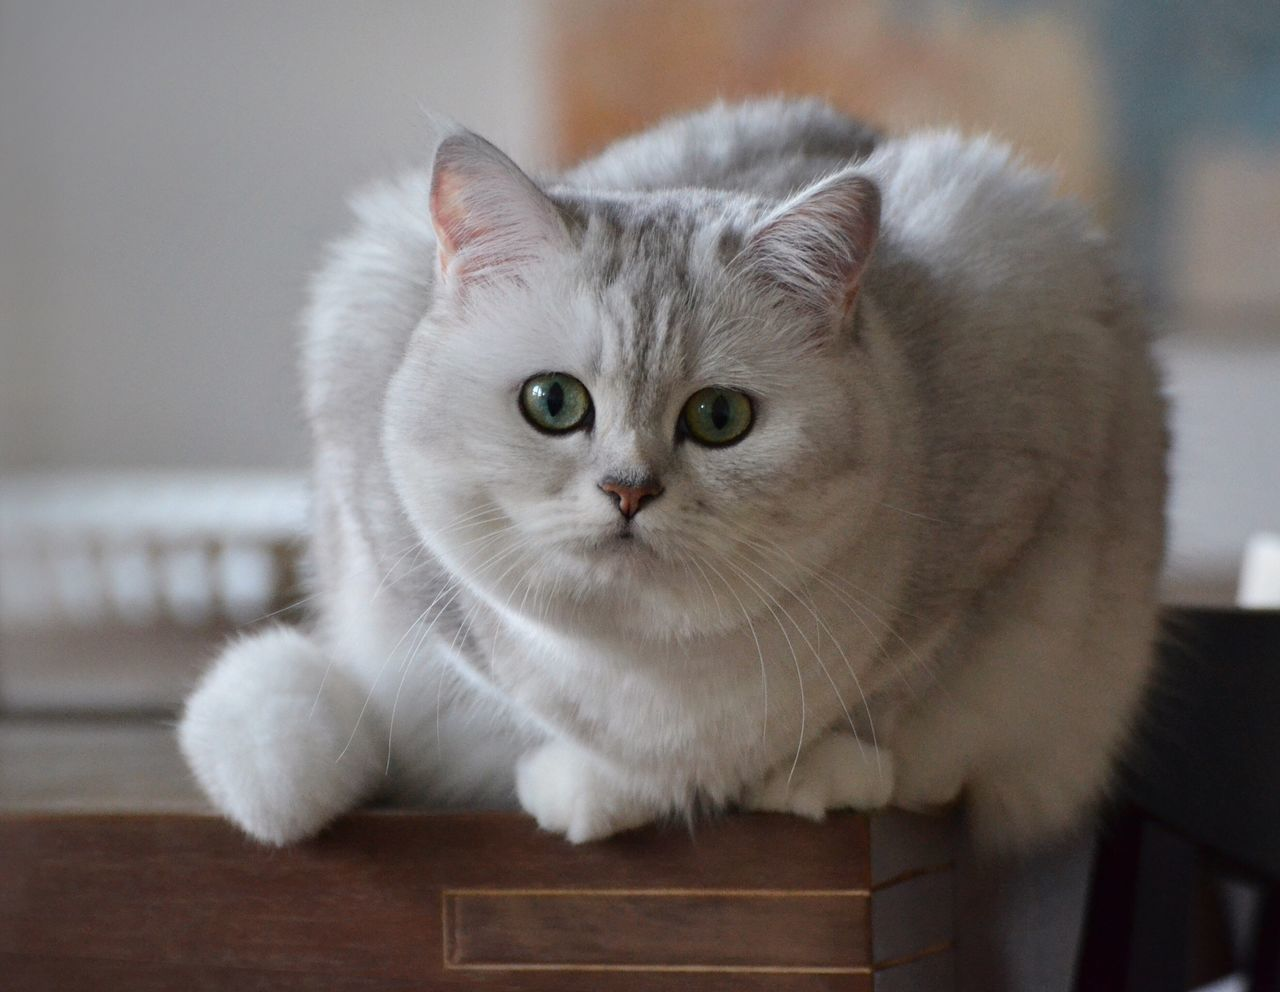 Catlady Feline Follow Green Eyes Beauty Cat Cats Carlovers Cats Of EyeEm Lovely Friend Home Photography Animals Pets